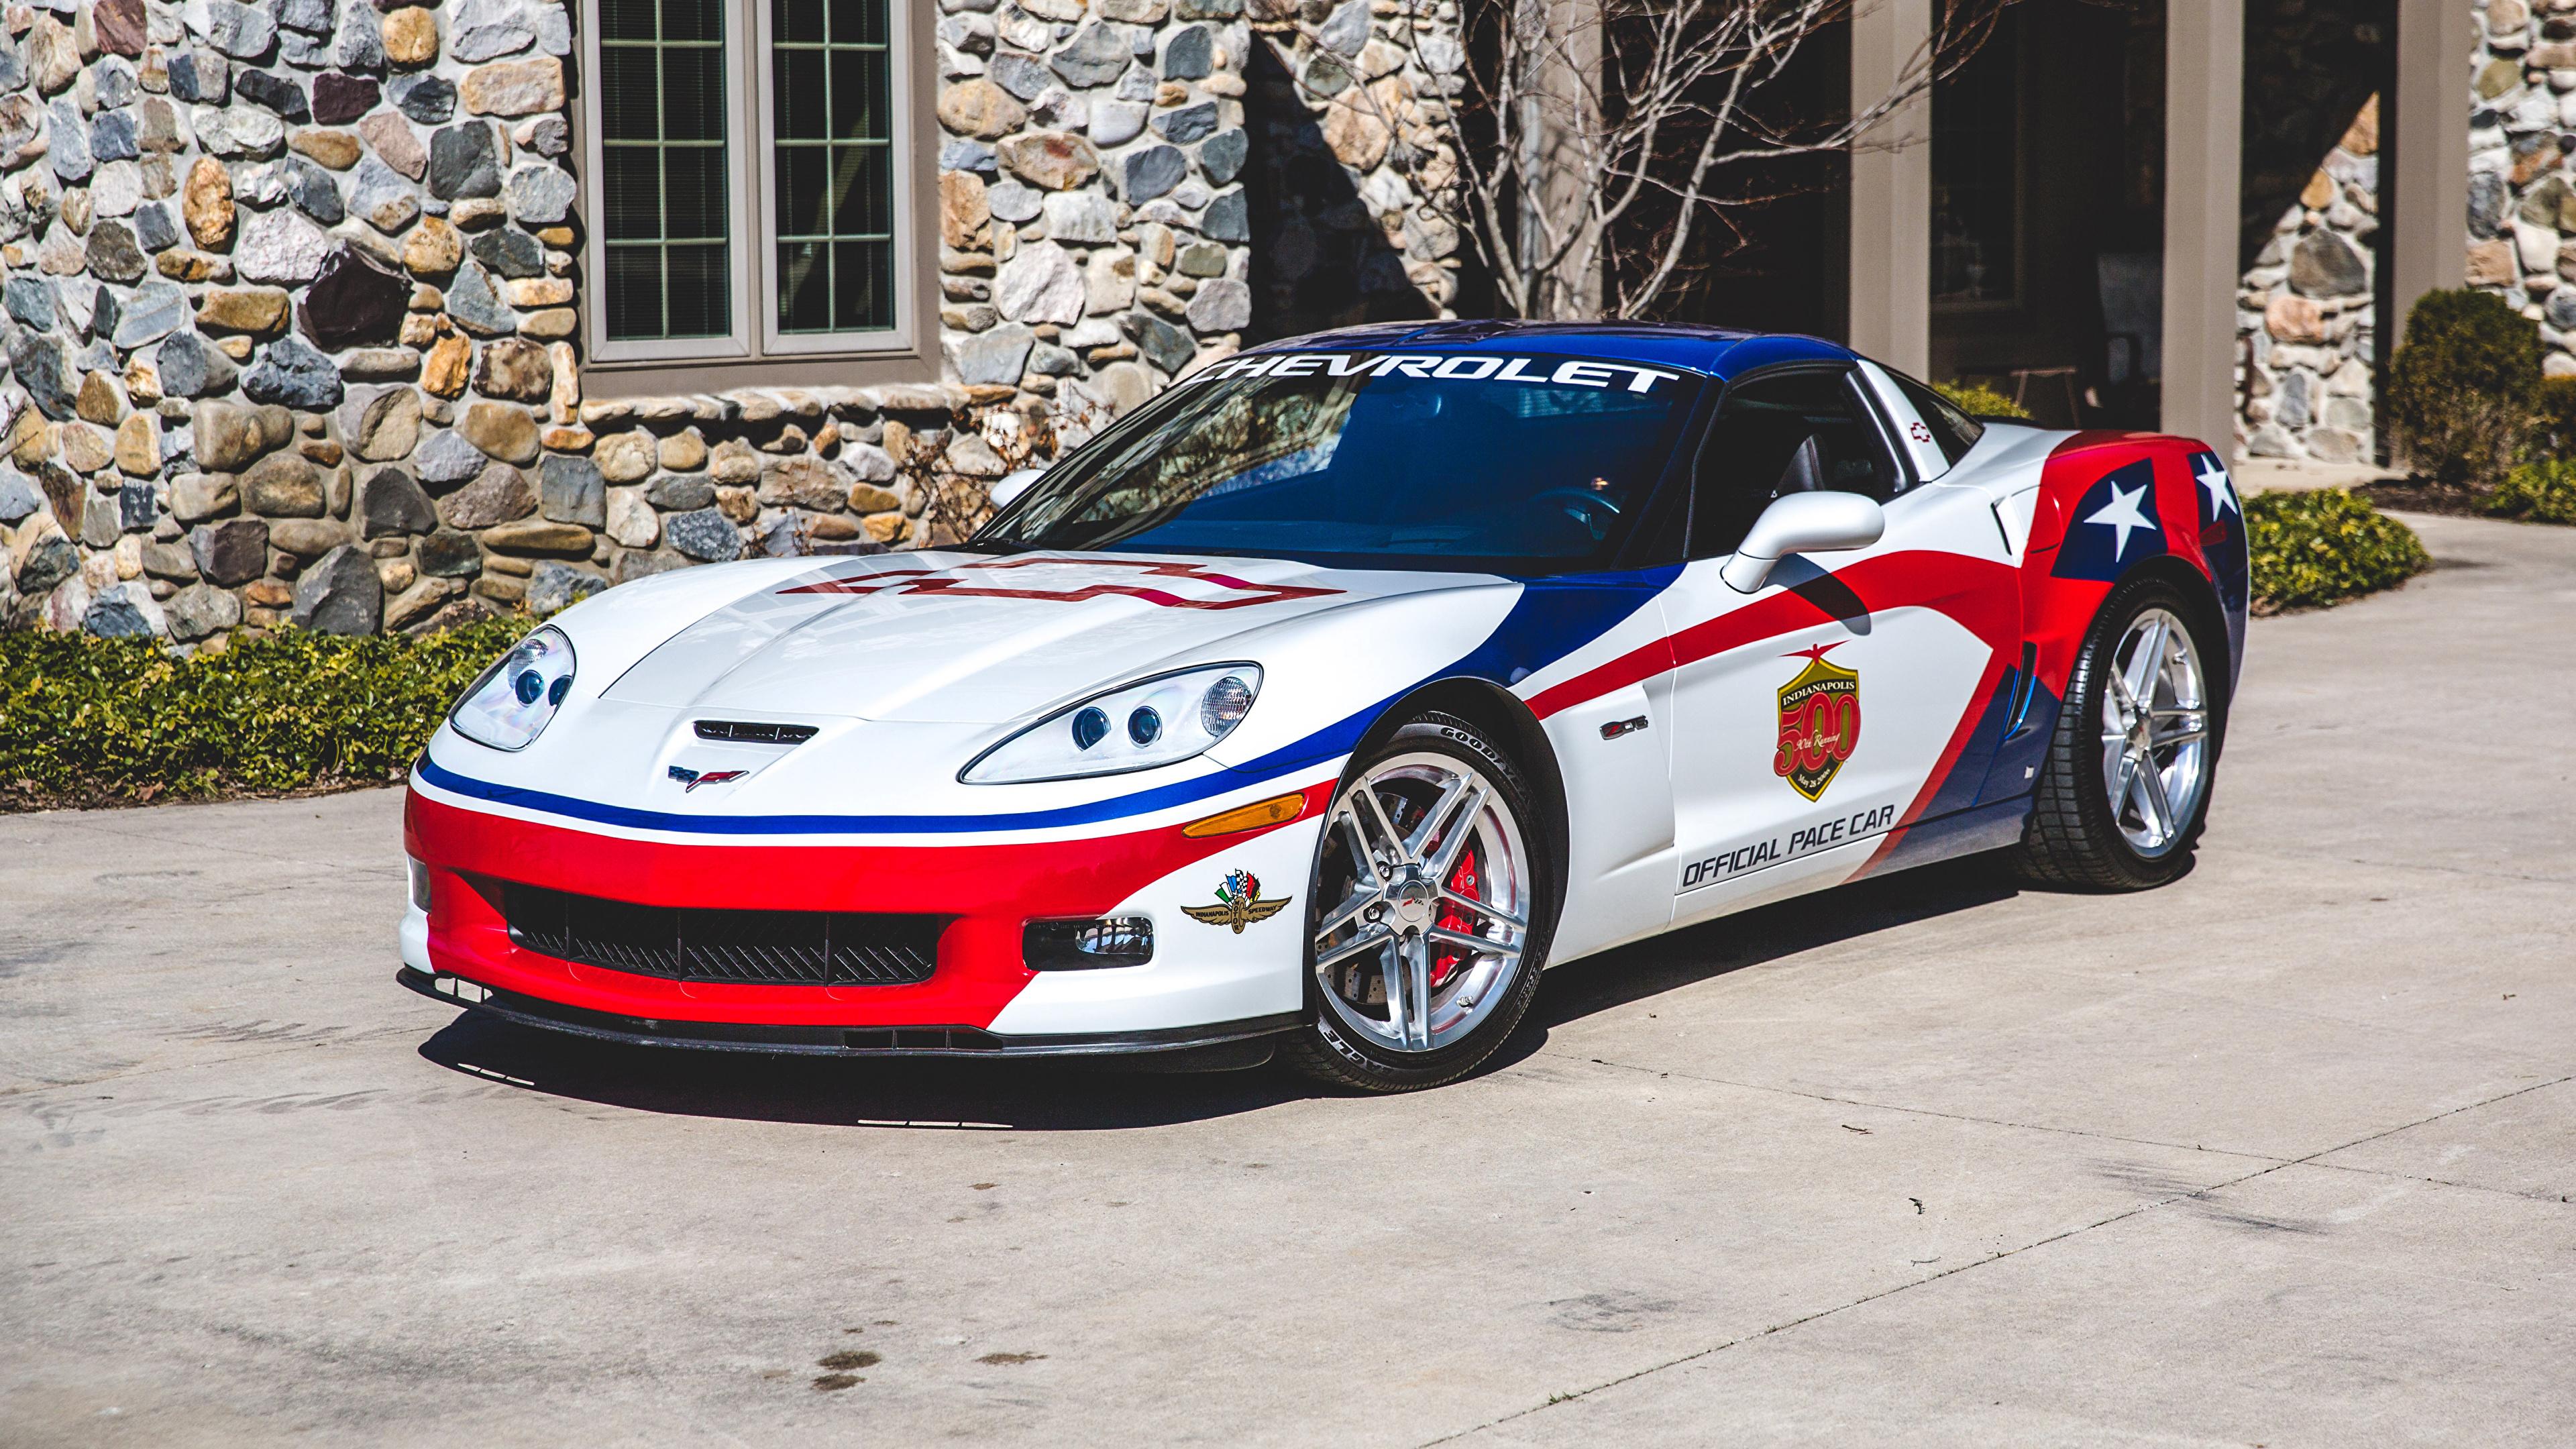 Pictures Tuning Chevrolet 2006 Corvette Z06 Indianapolis 500 Pace Car White Cars 3840x2160 auto automobile